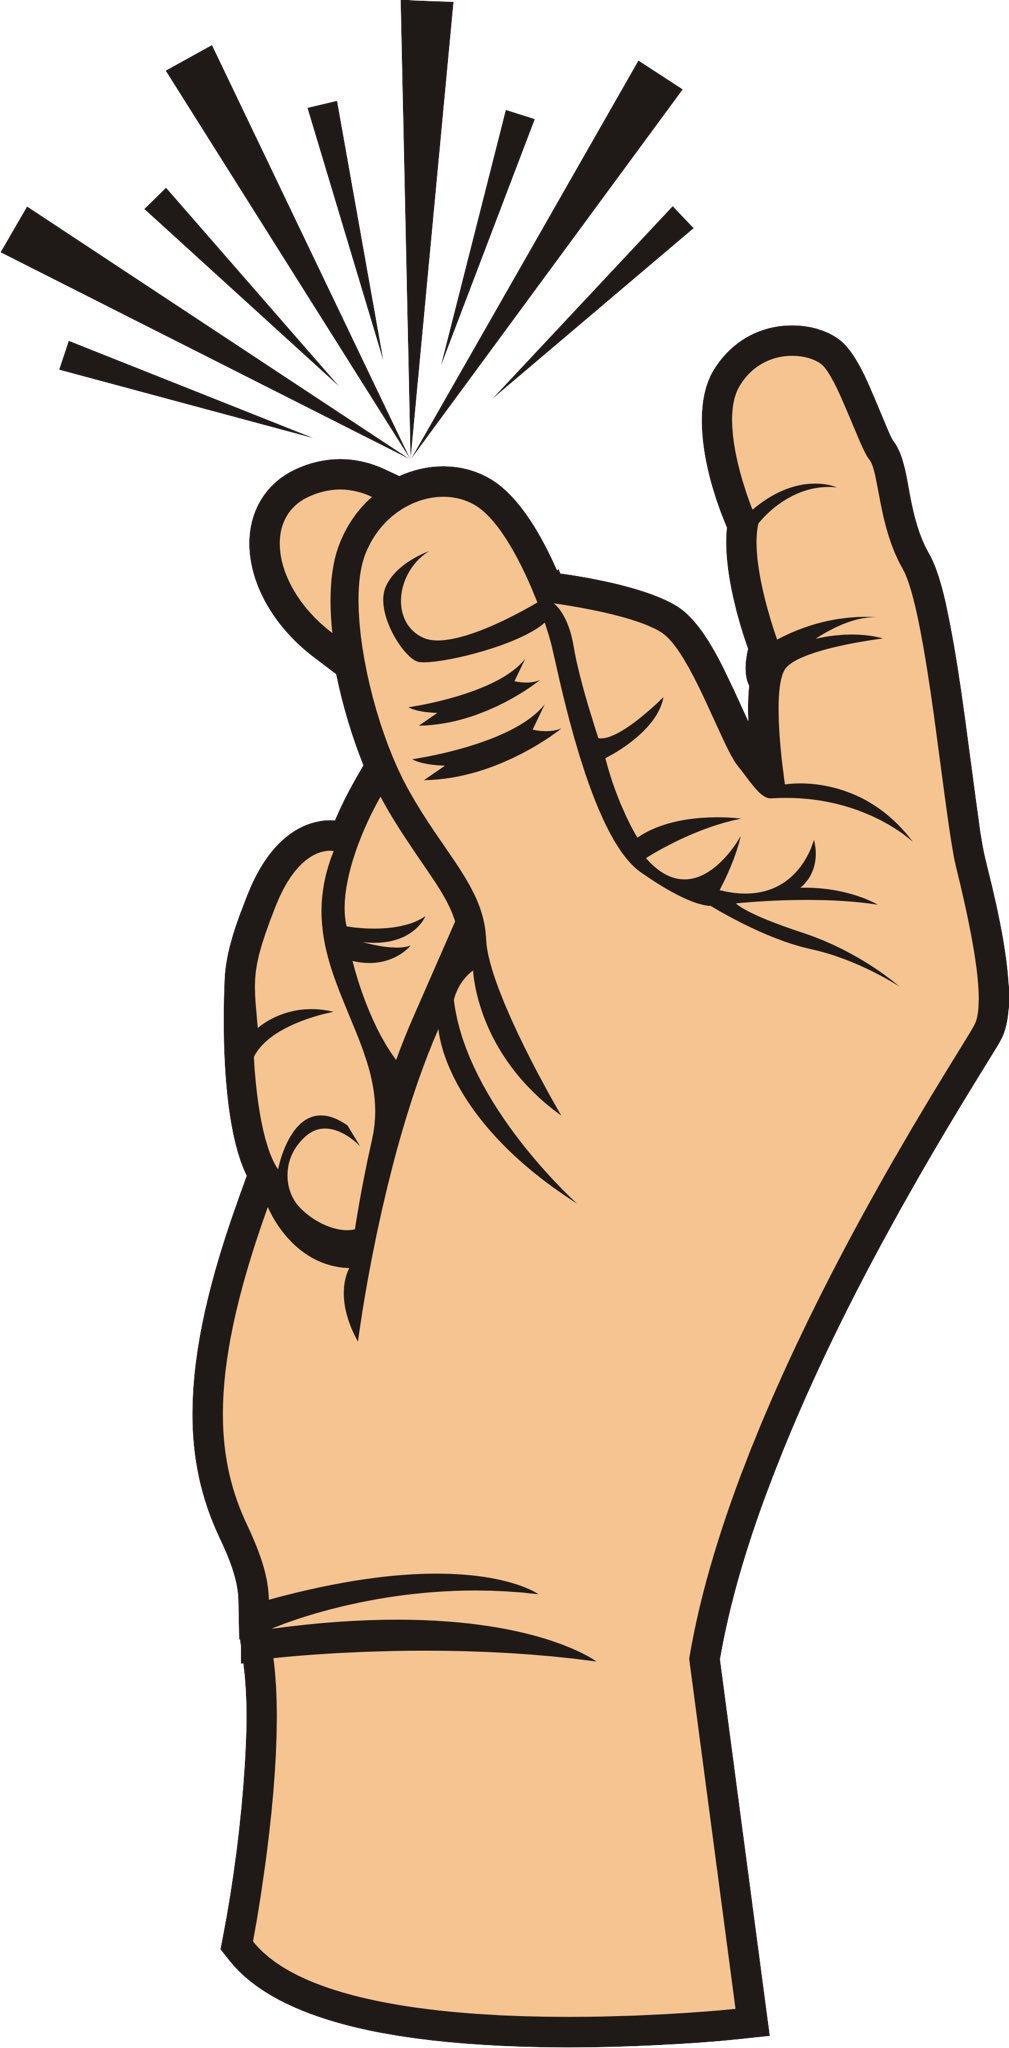 Finger orange x free. Fingers clipart snap